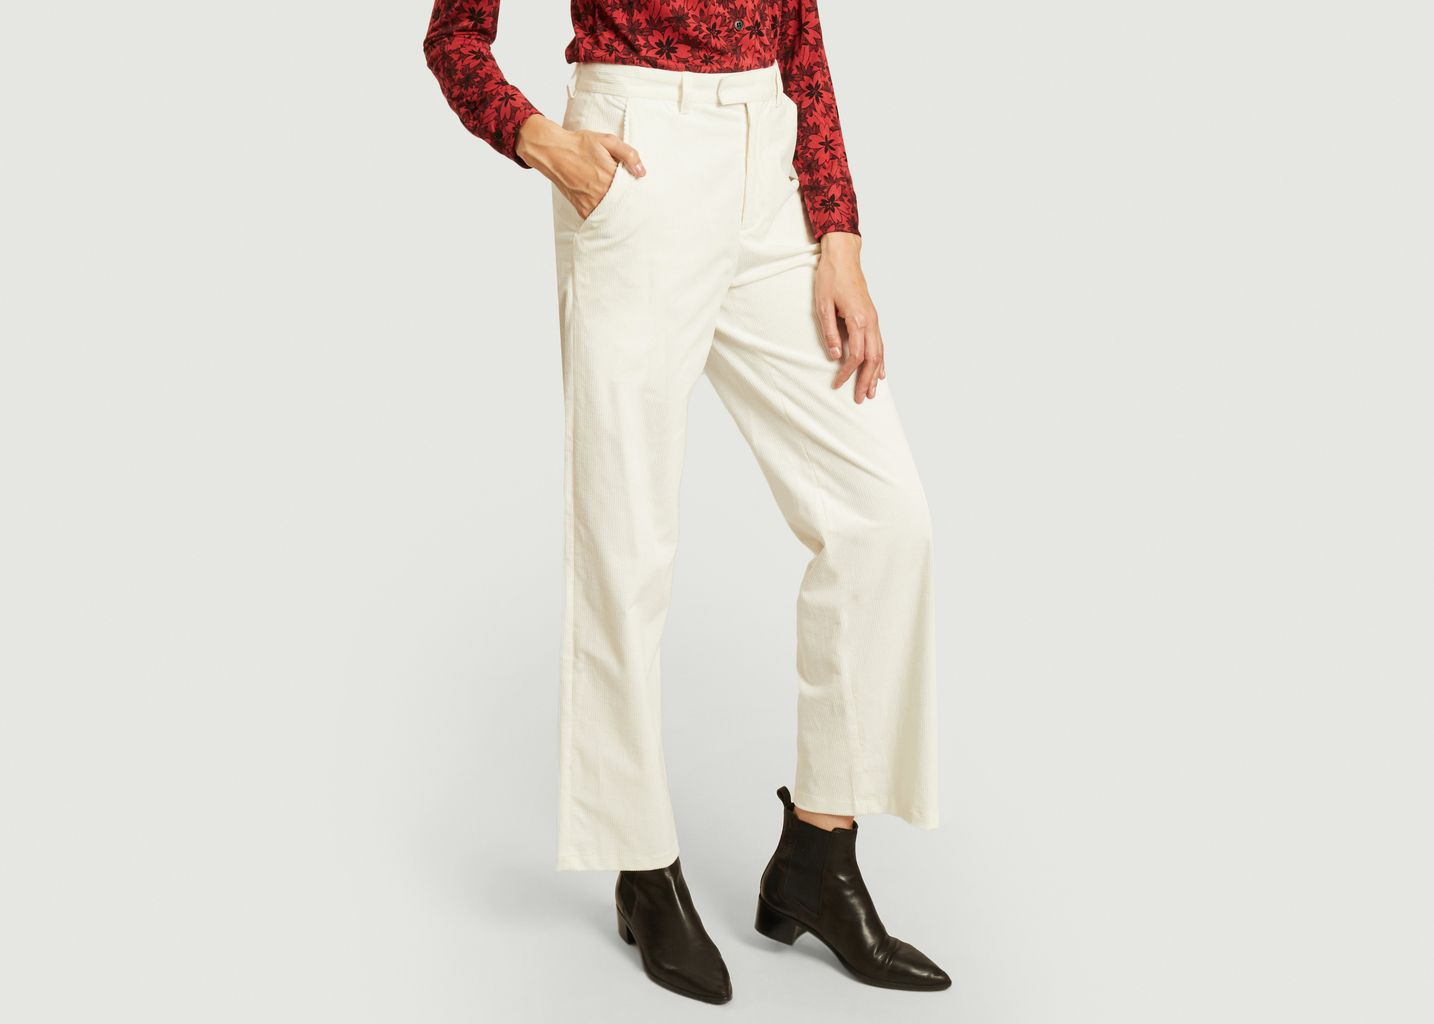 Pantalon Boy en velours côtelé - agnès b.